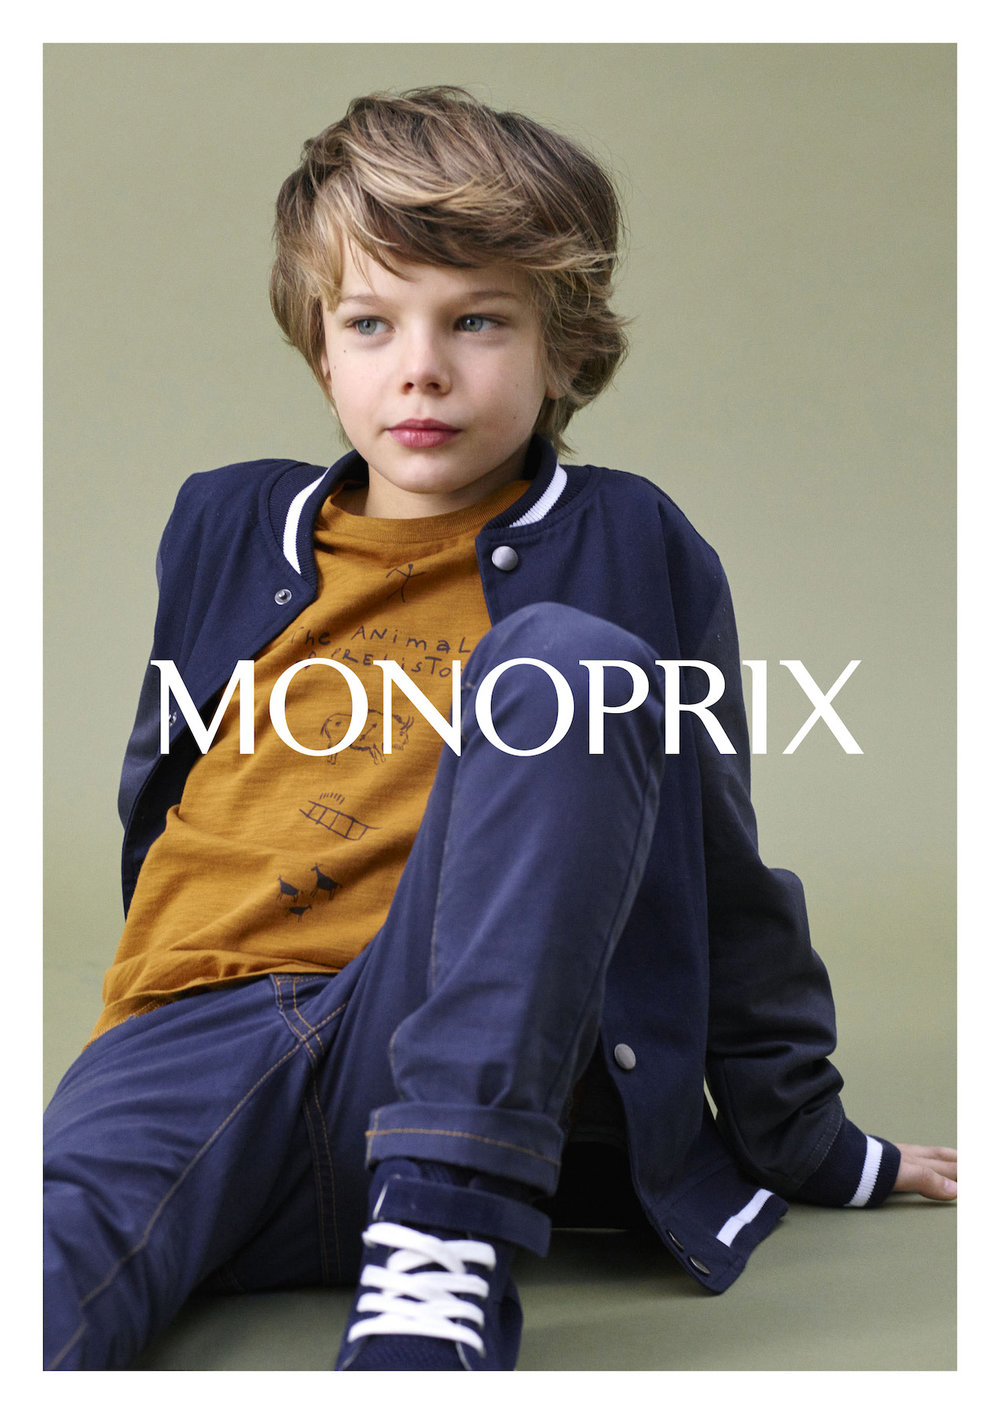 019-icon-artist-management-Kristin-Vicari-Commissions-MONOPRIX.jpg